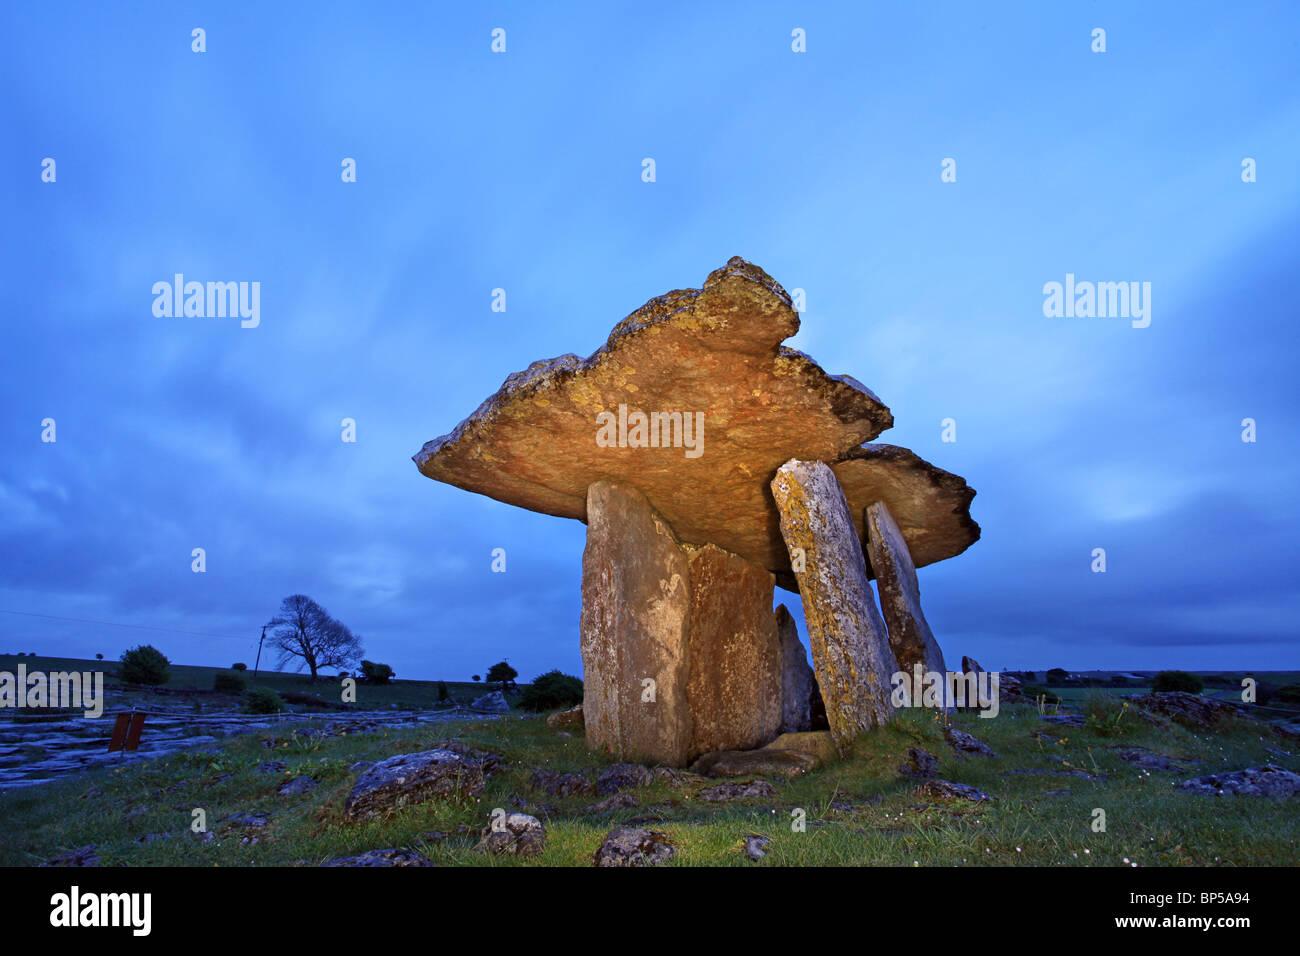 The Poulnabrone Dolmen, The Burren, Co Clare. Ireland. - Stock Image